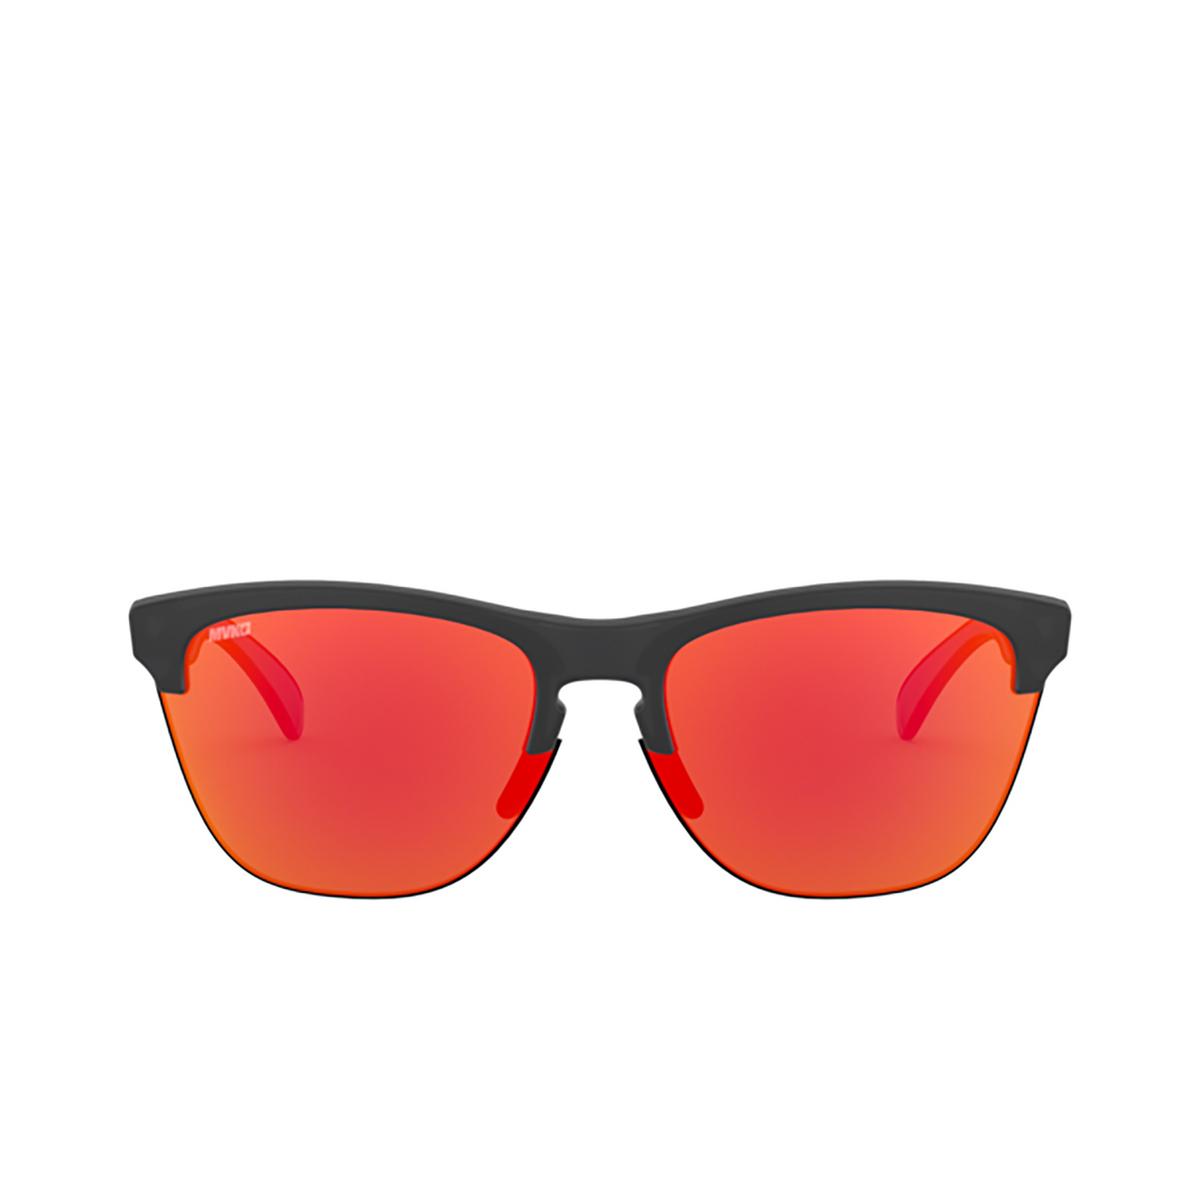 Oakley® Round Sunglasses: Frogskins Lite OO9374 color Matte Black Ink 937427 - 1/3.